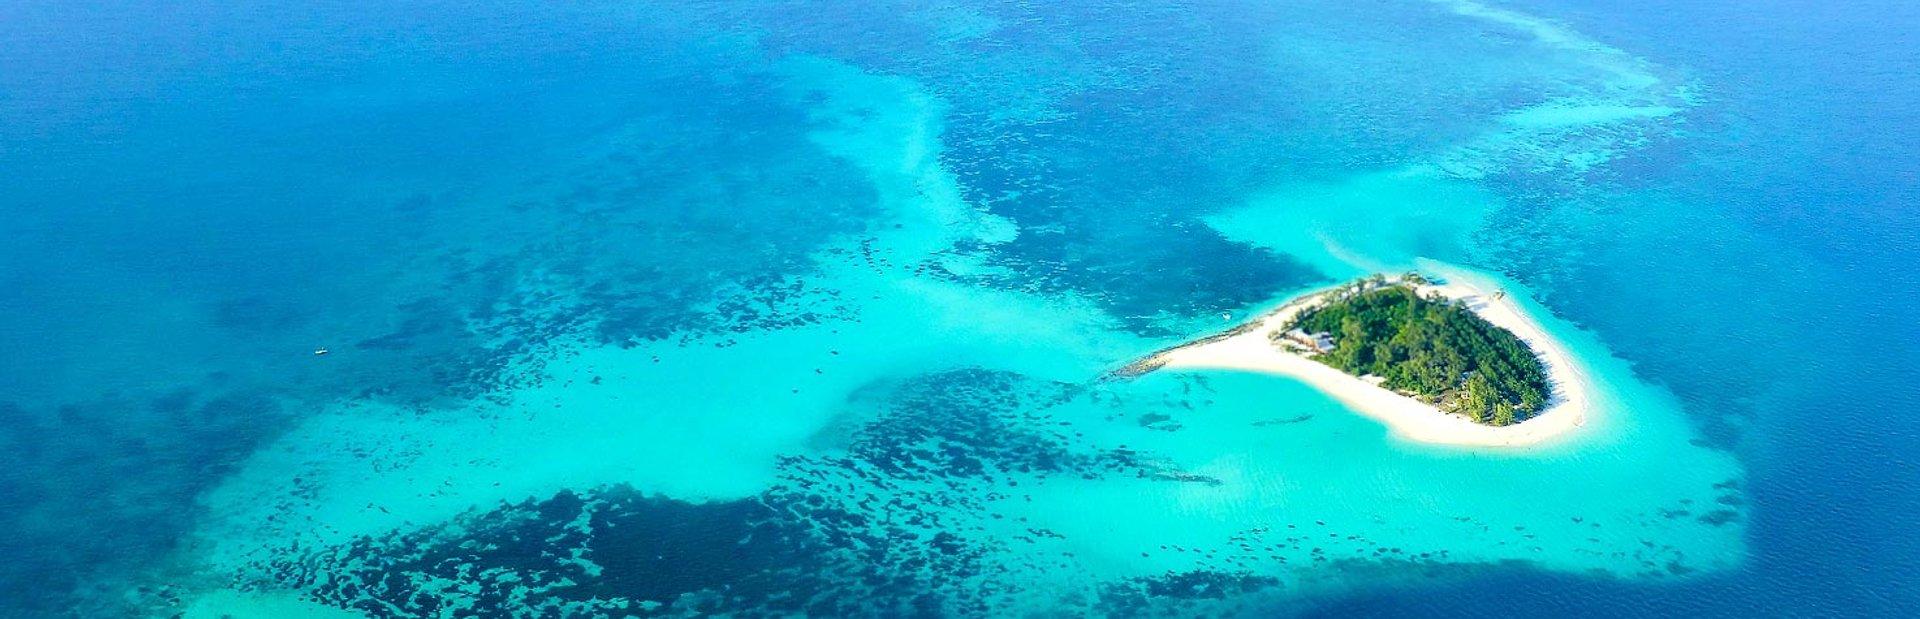 Thanda Island - The Award-Winning Private Island in the Indian Ocean